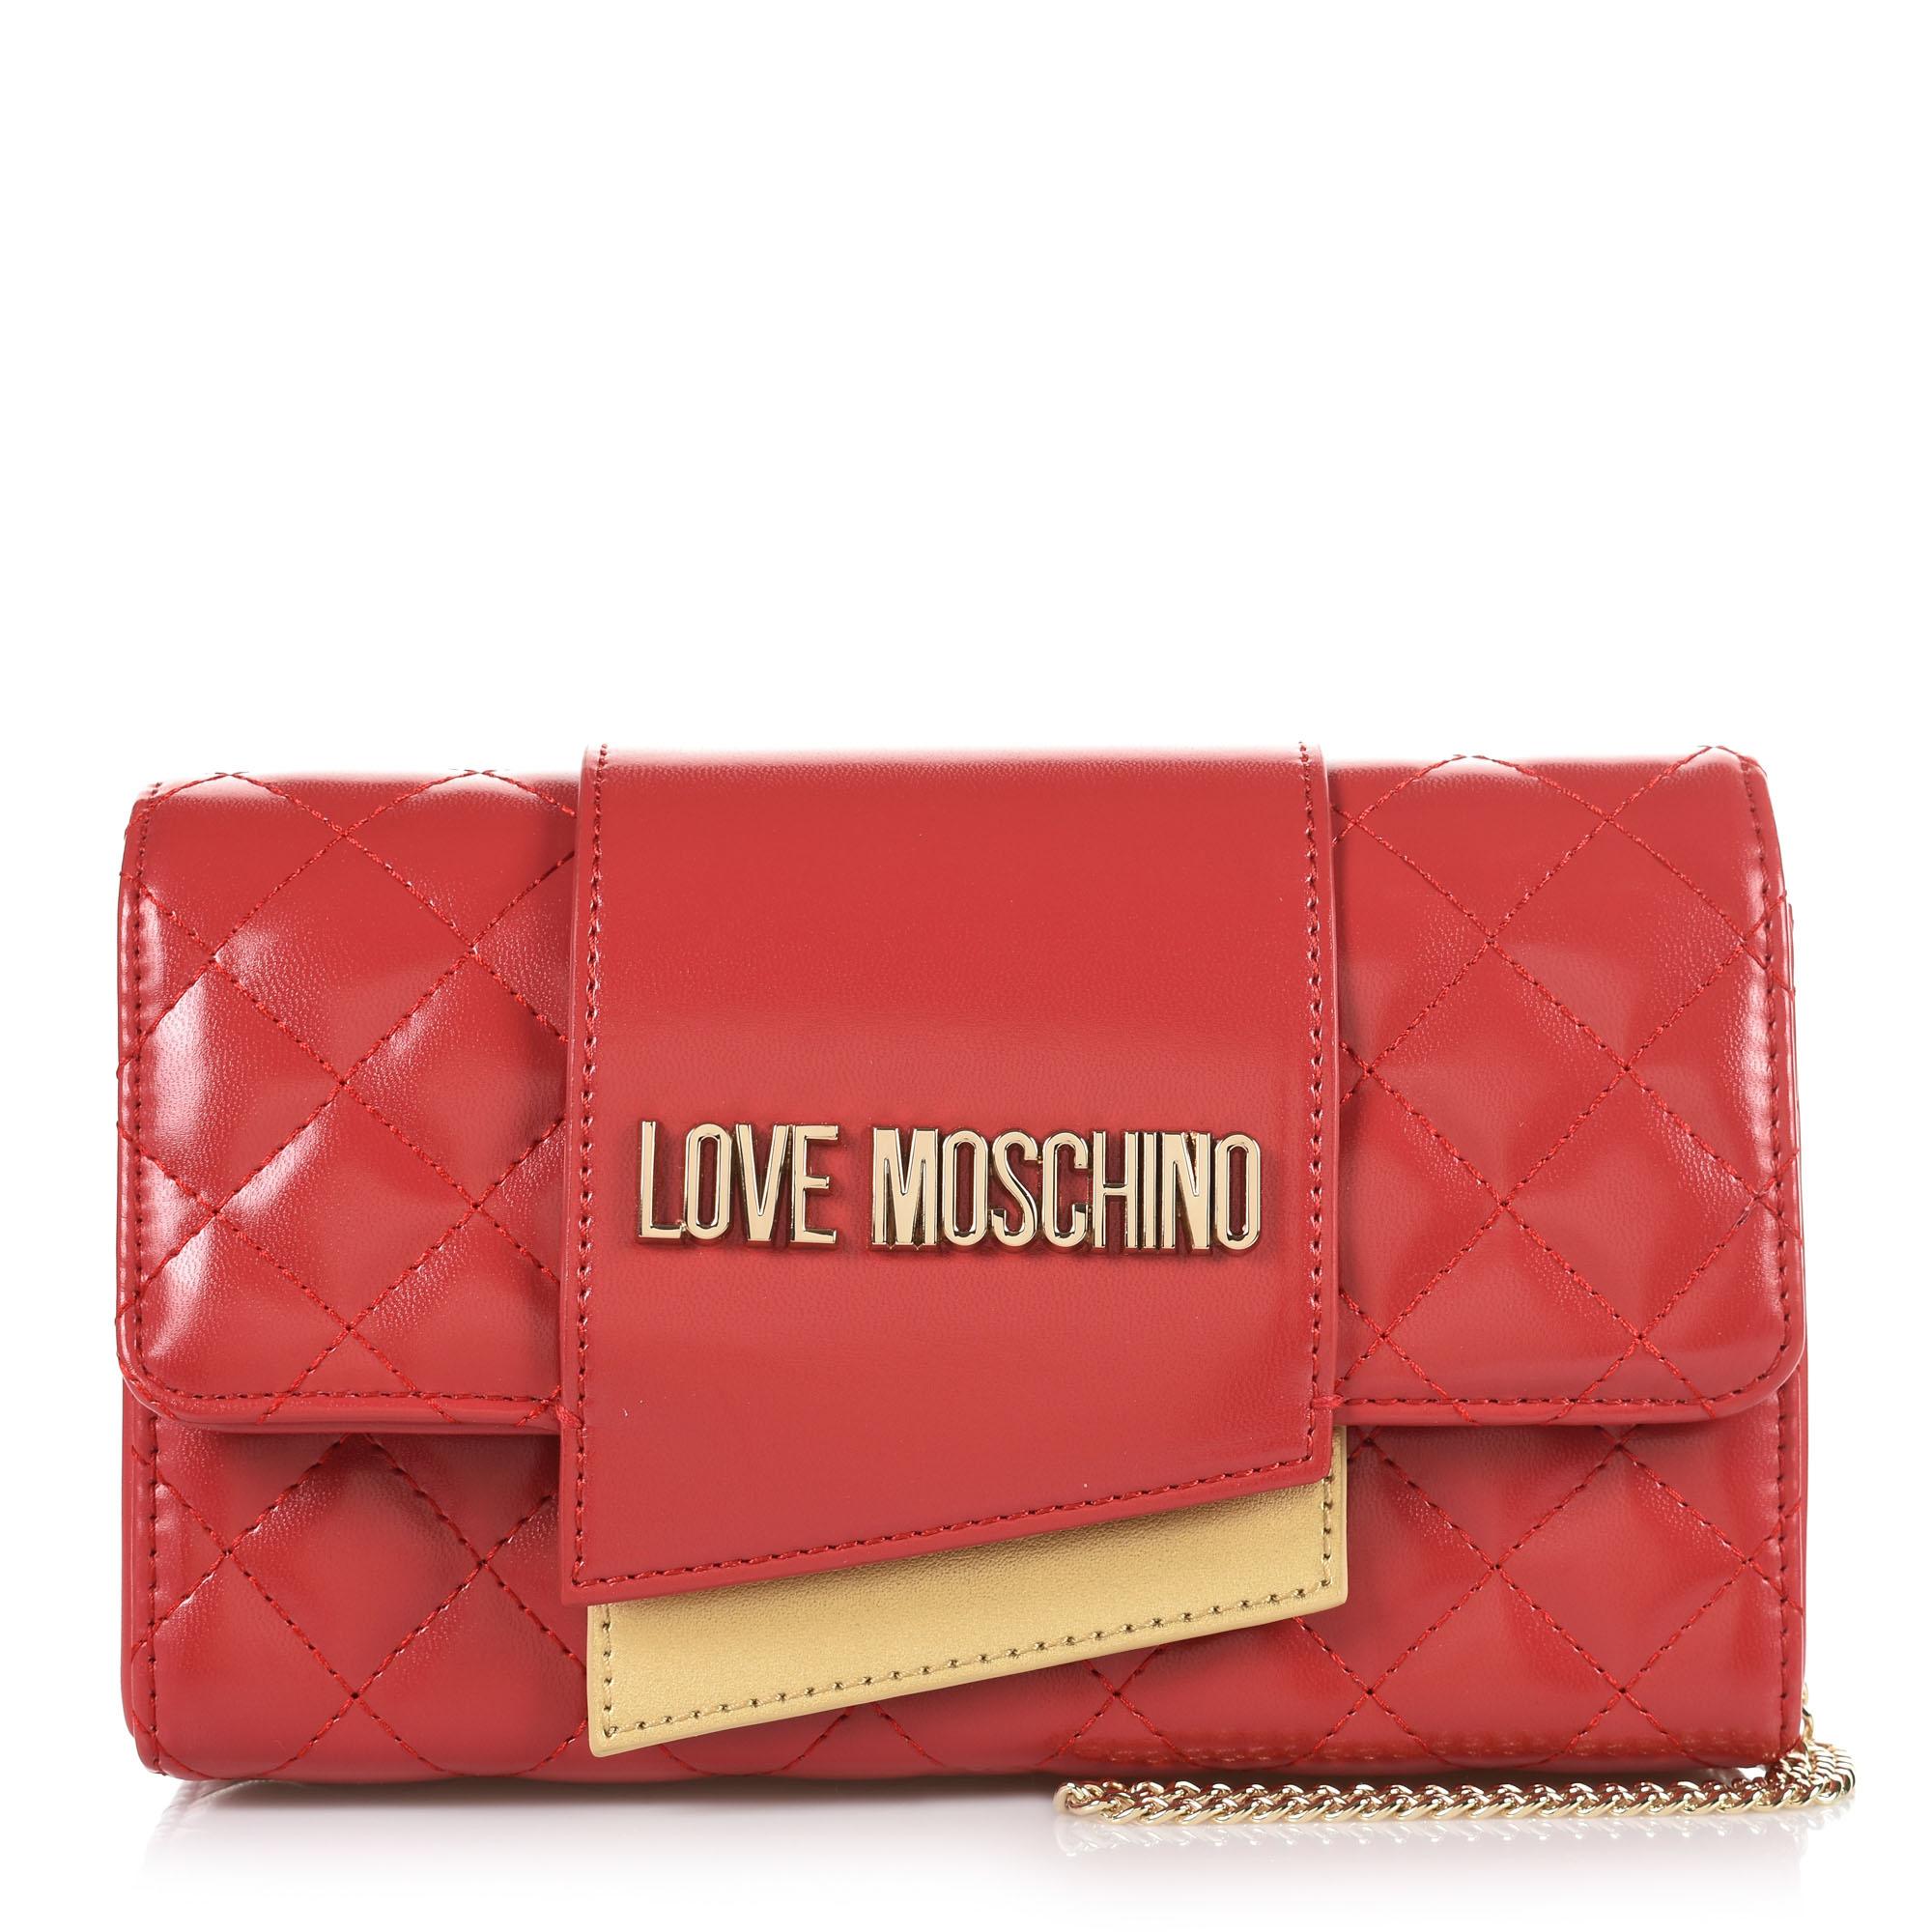 f830dc91822a Τσαντάκι Ώμου-Χιαστί Love Moschino Borsa Quilted Nappa JC4295PP07KA